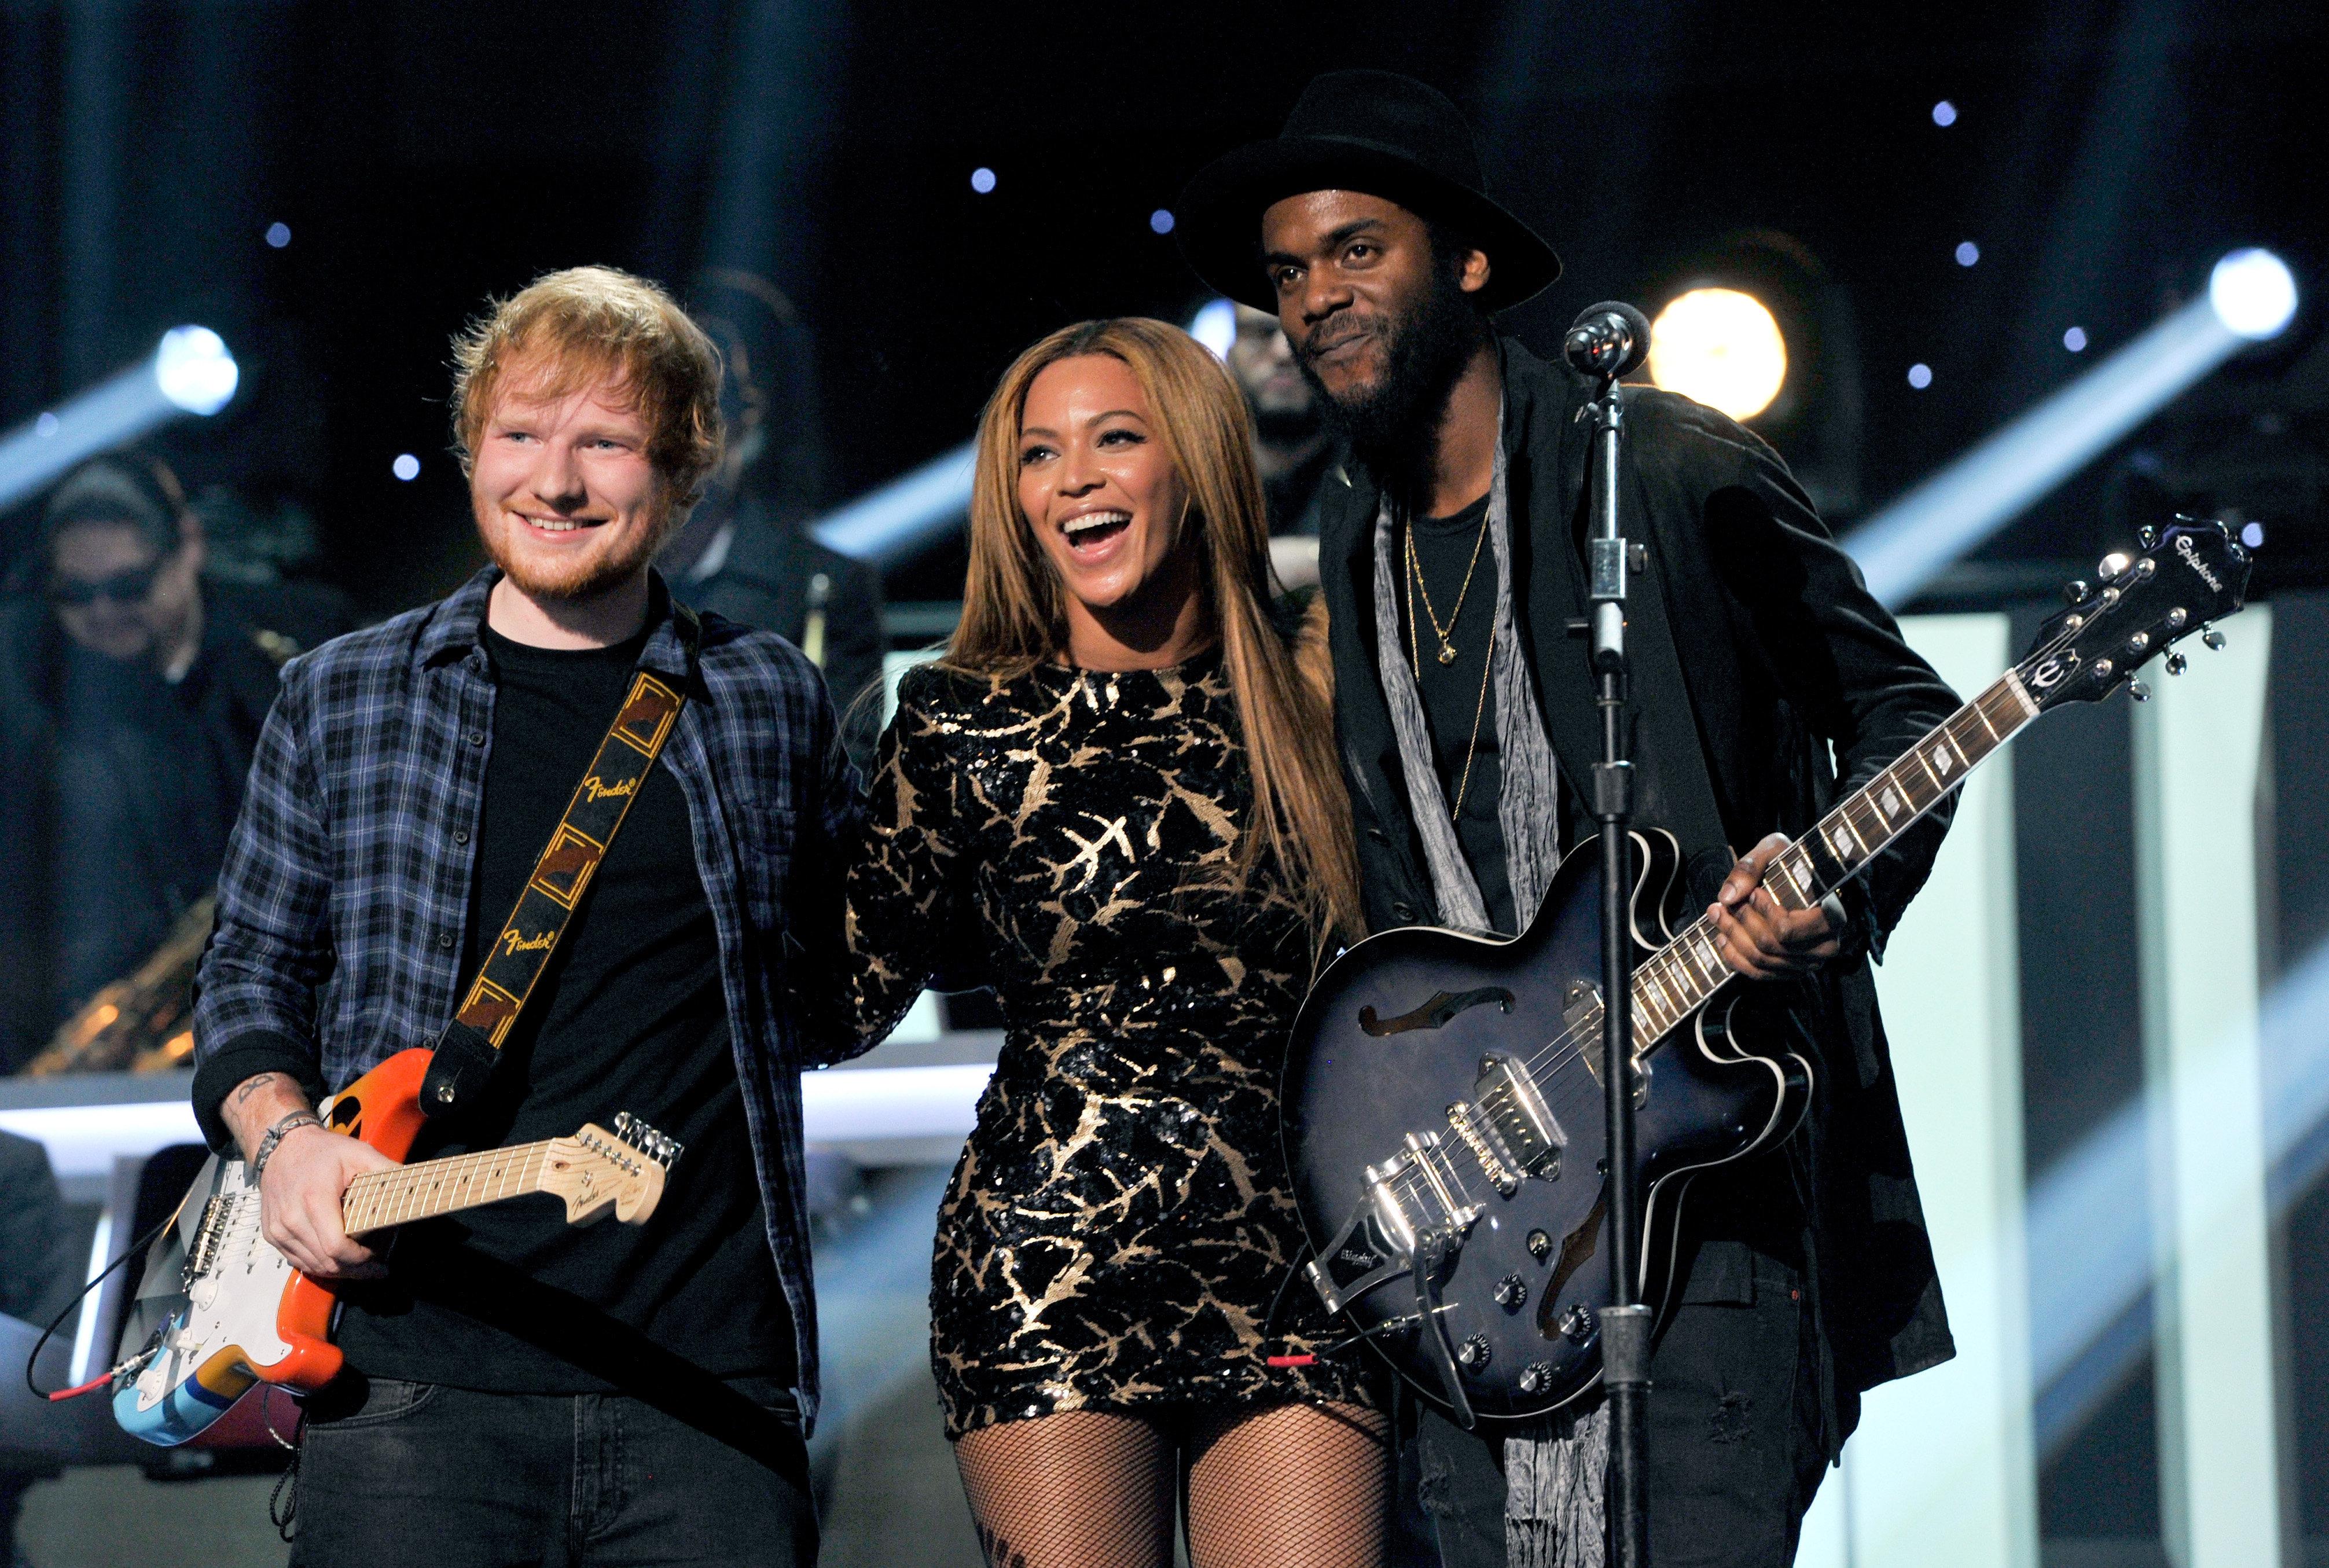 Ed Sheeran,Beyoncé and Gary Clark Jr. performing together on Feb. 10, 2015.